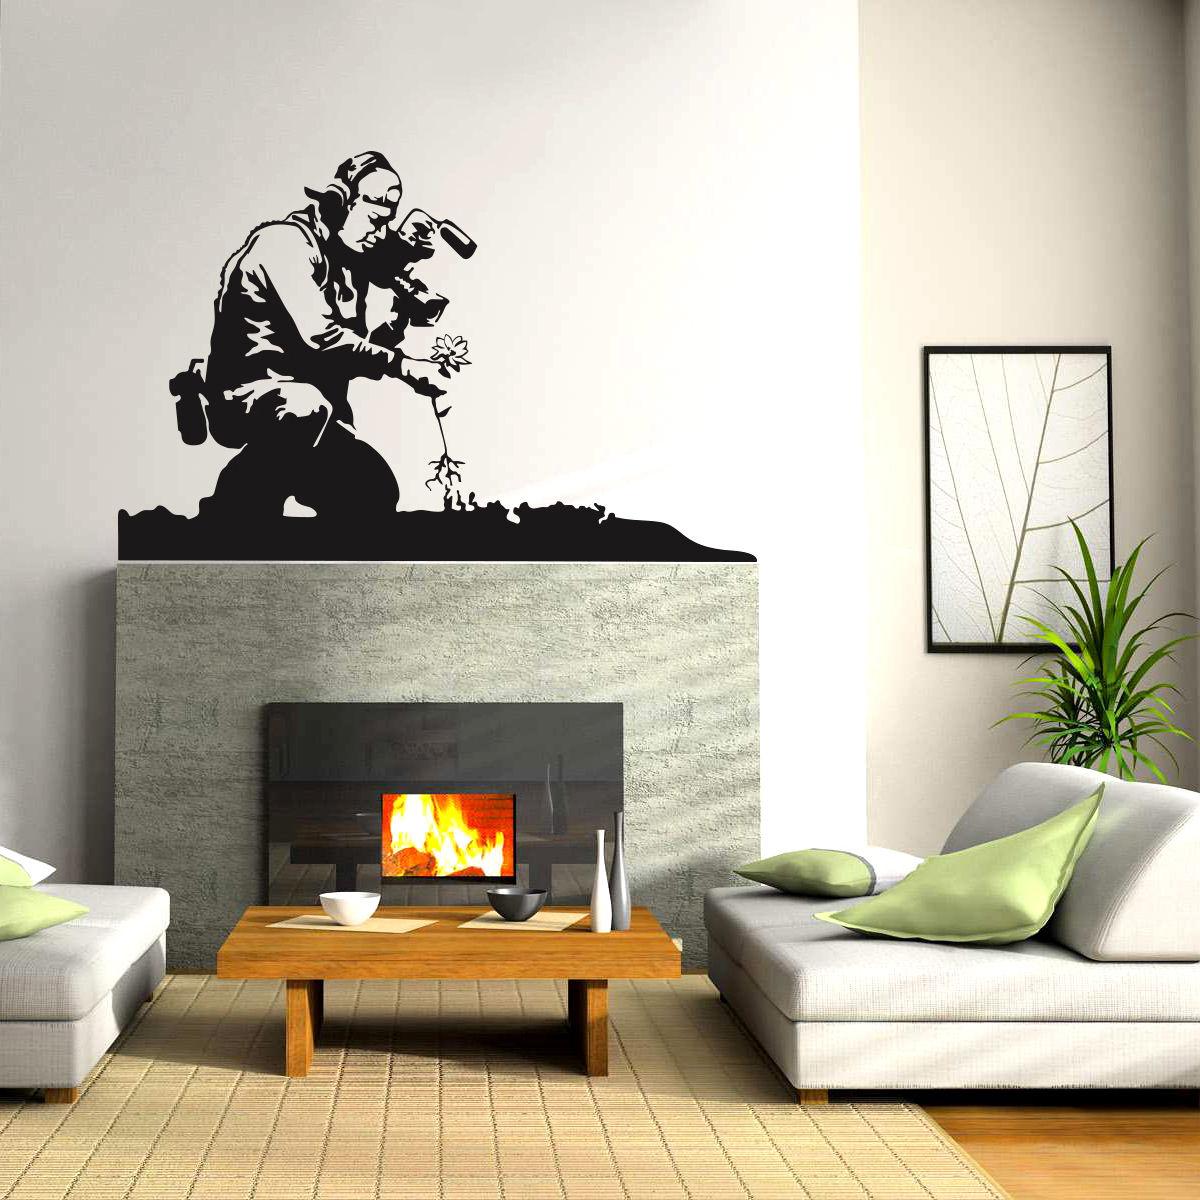 Graffiti wall vinyl - New Wall Decal Sticker Vinyl Street Art Graffiti Bedroom Kitchen Cameraman Free Shipping China